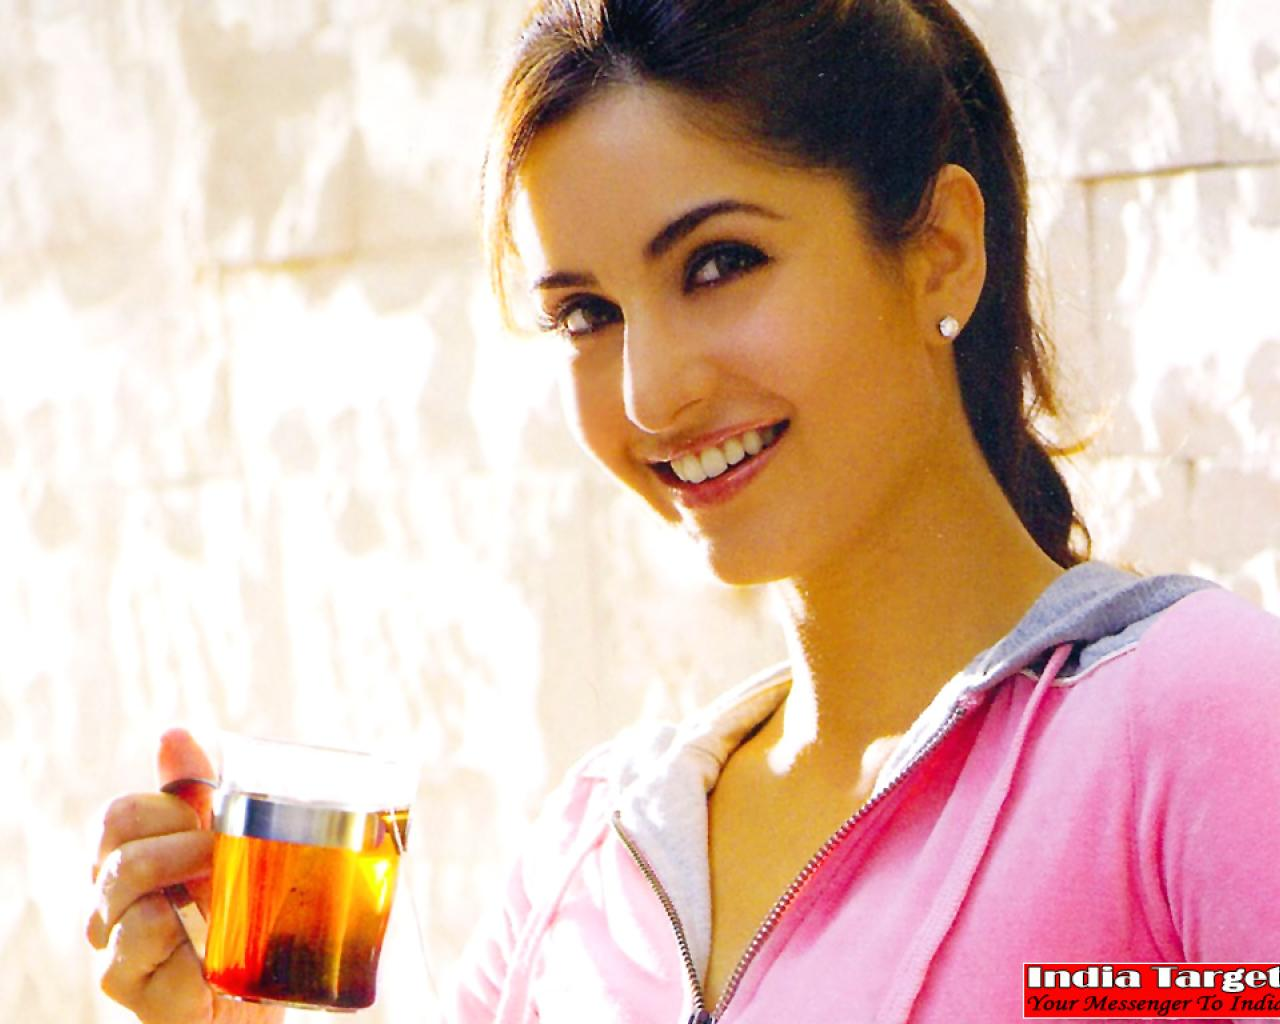 Top Hd Bollywood Wallapers Katrina Kaif Cute Wallpaper-3379